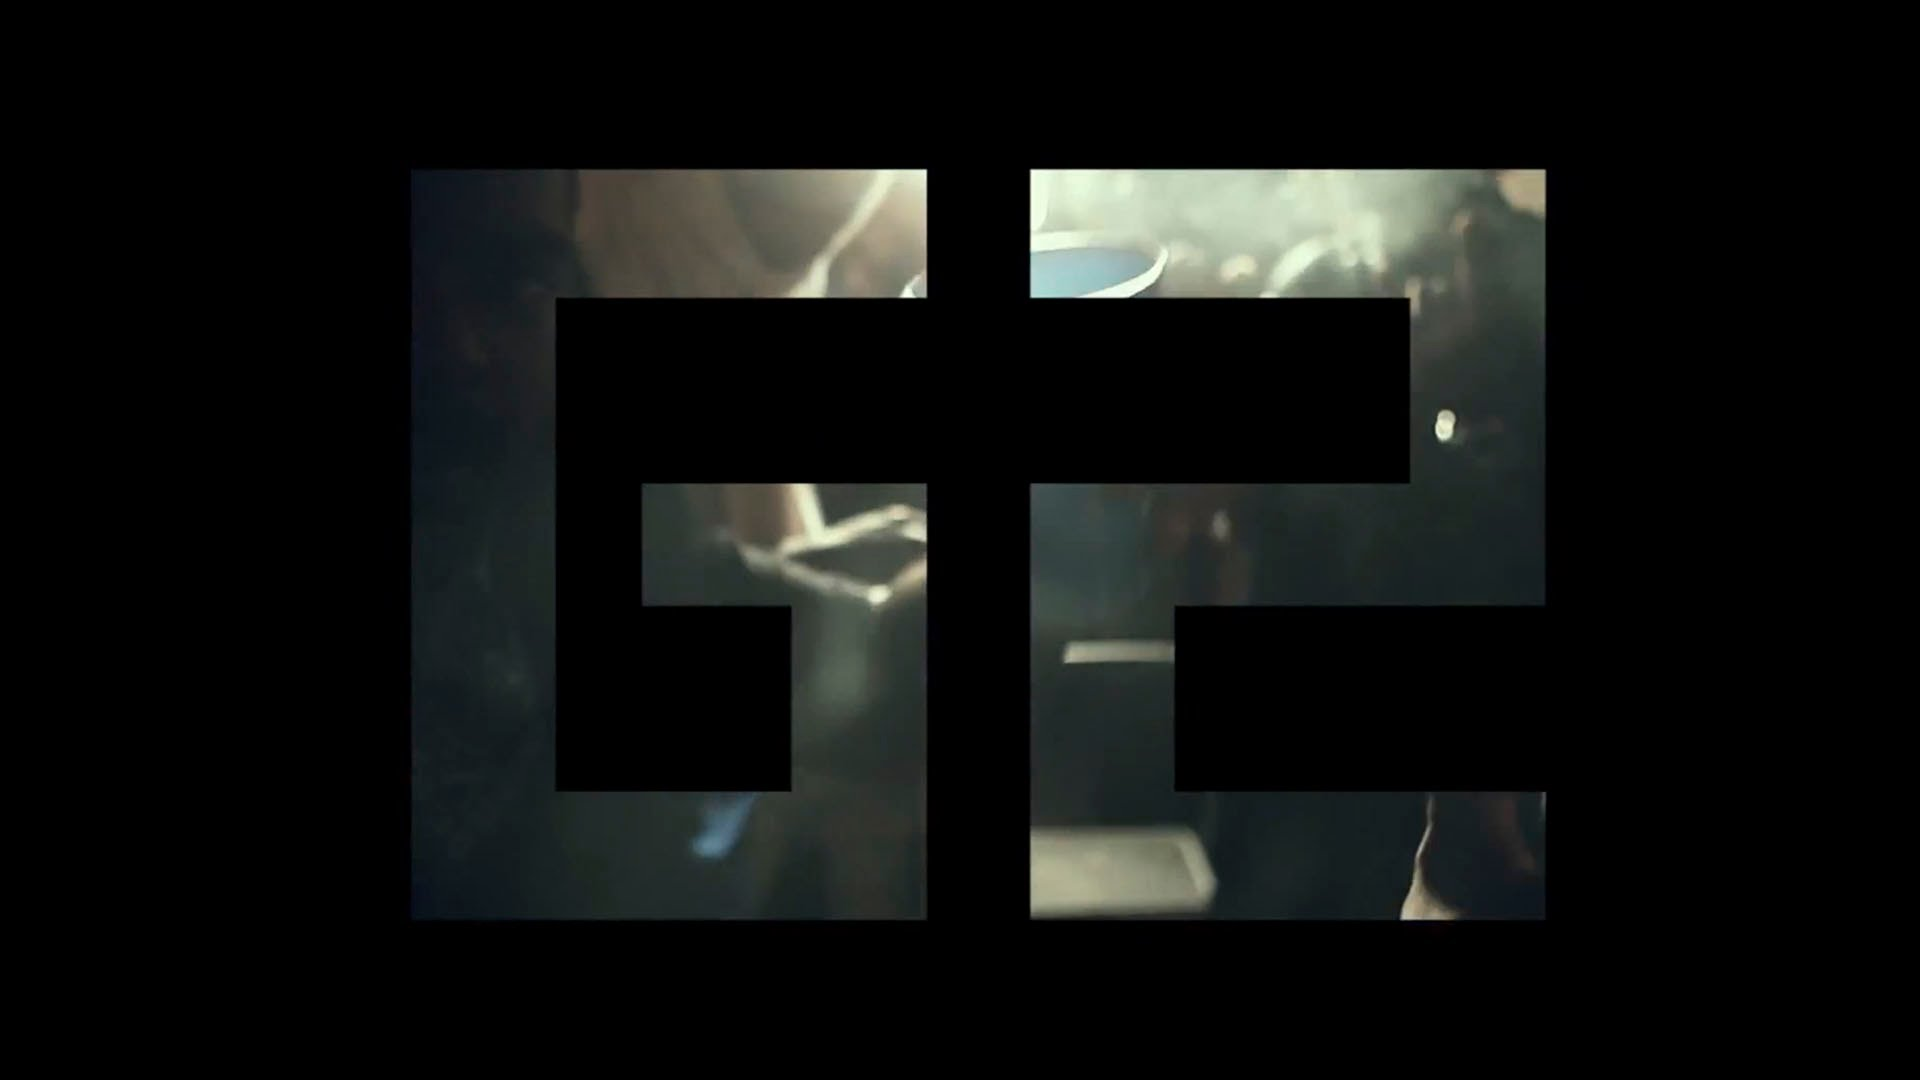 Chevy Woods Feat. DJ Drama – G2 Intro